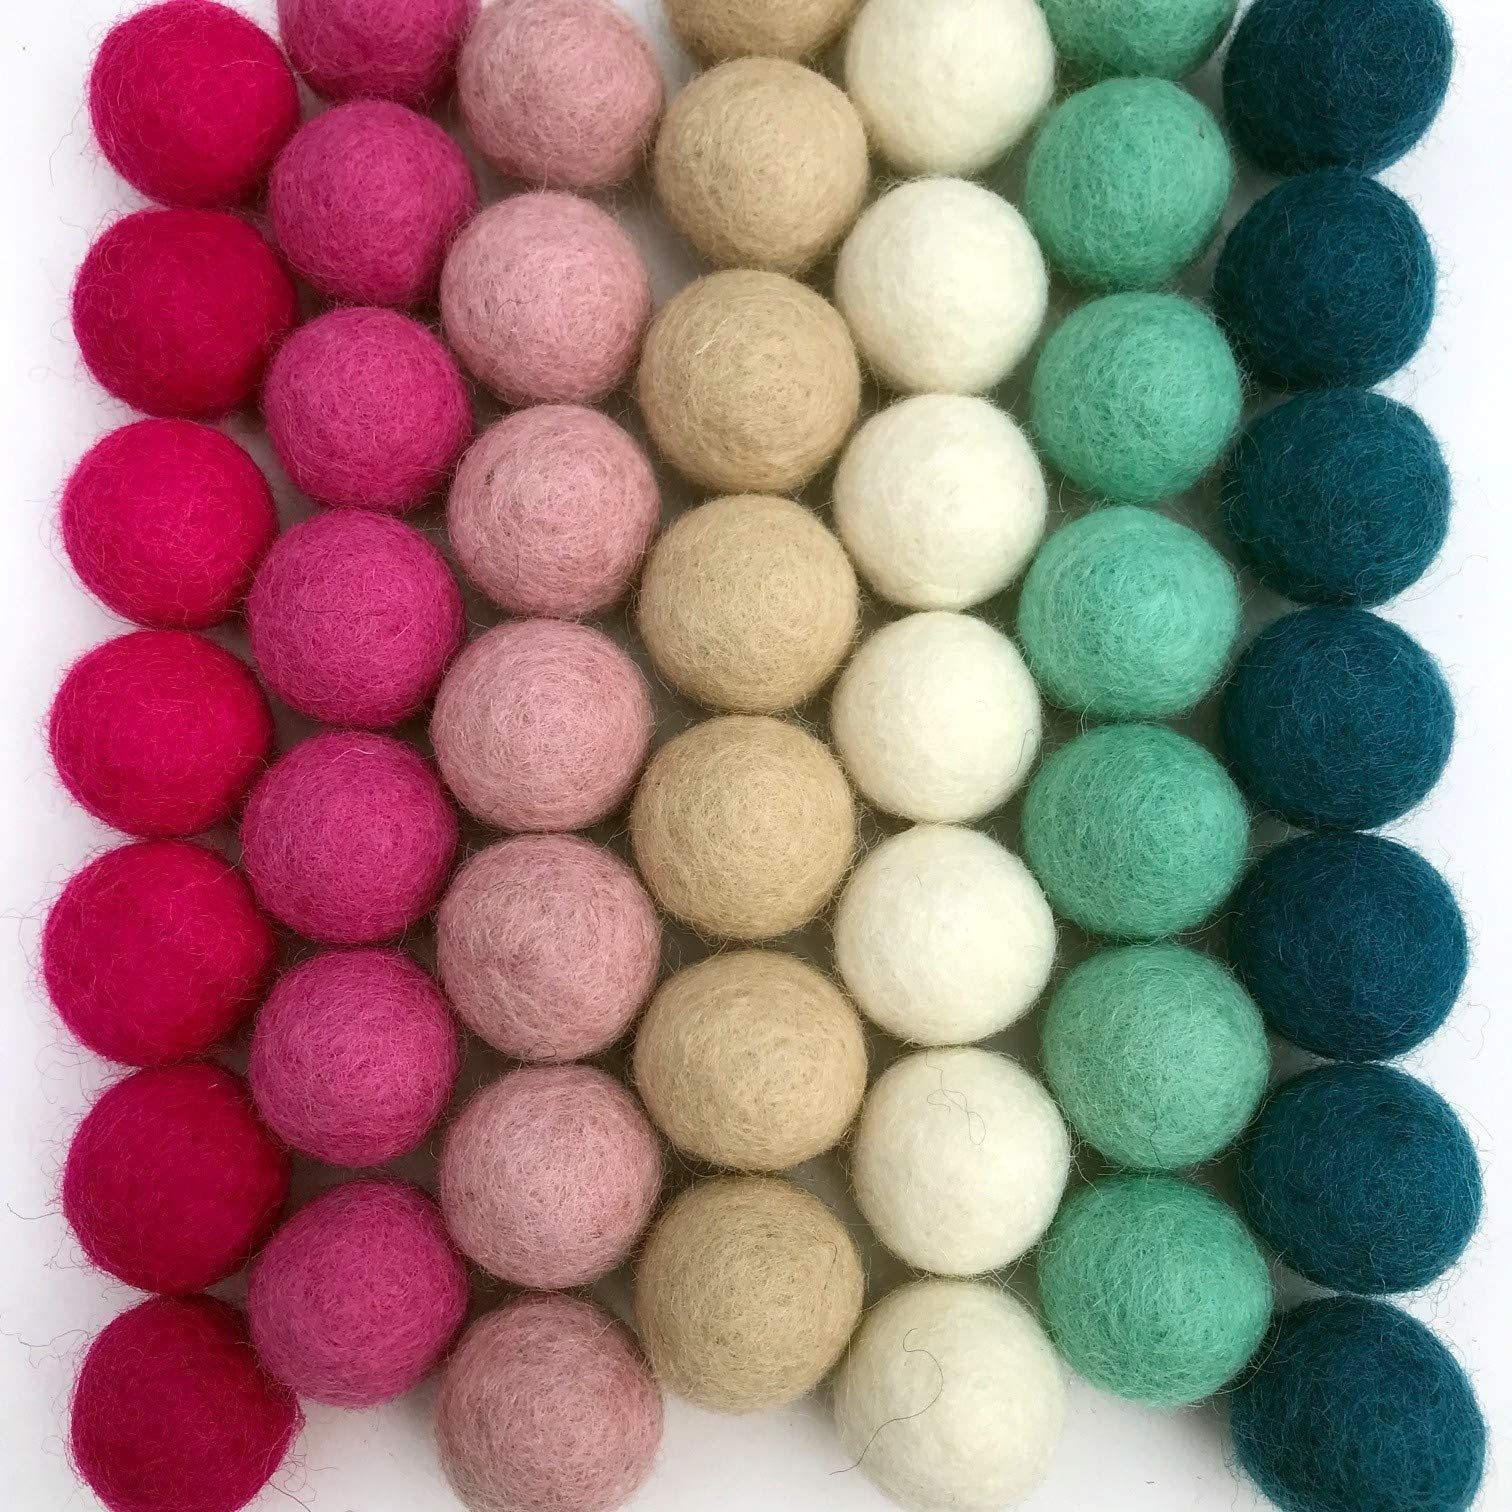 Chocolate Wool Felt Pom Pom Balls set of 12